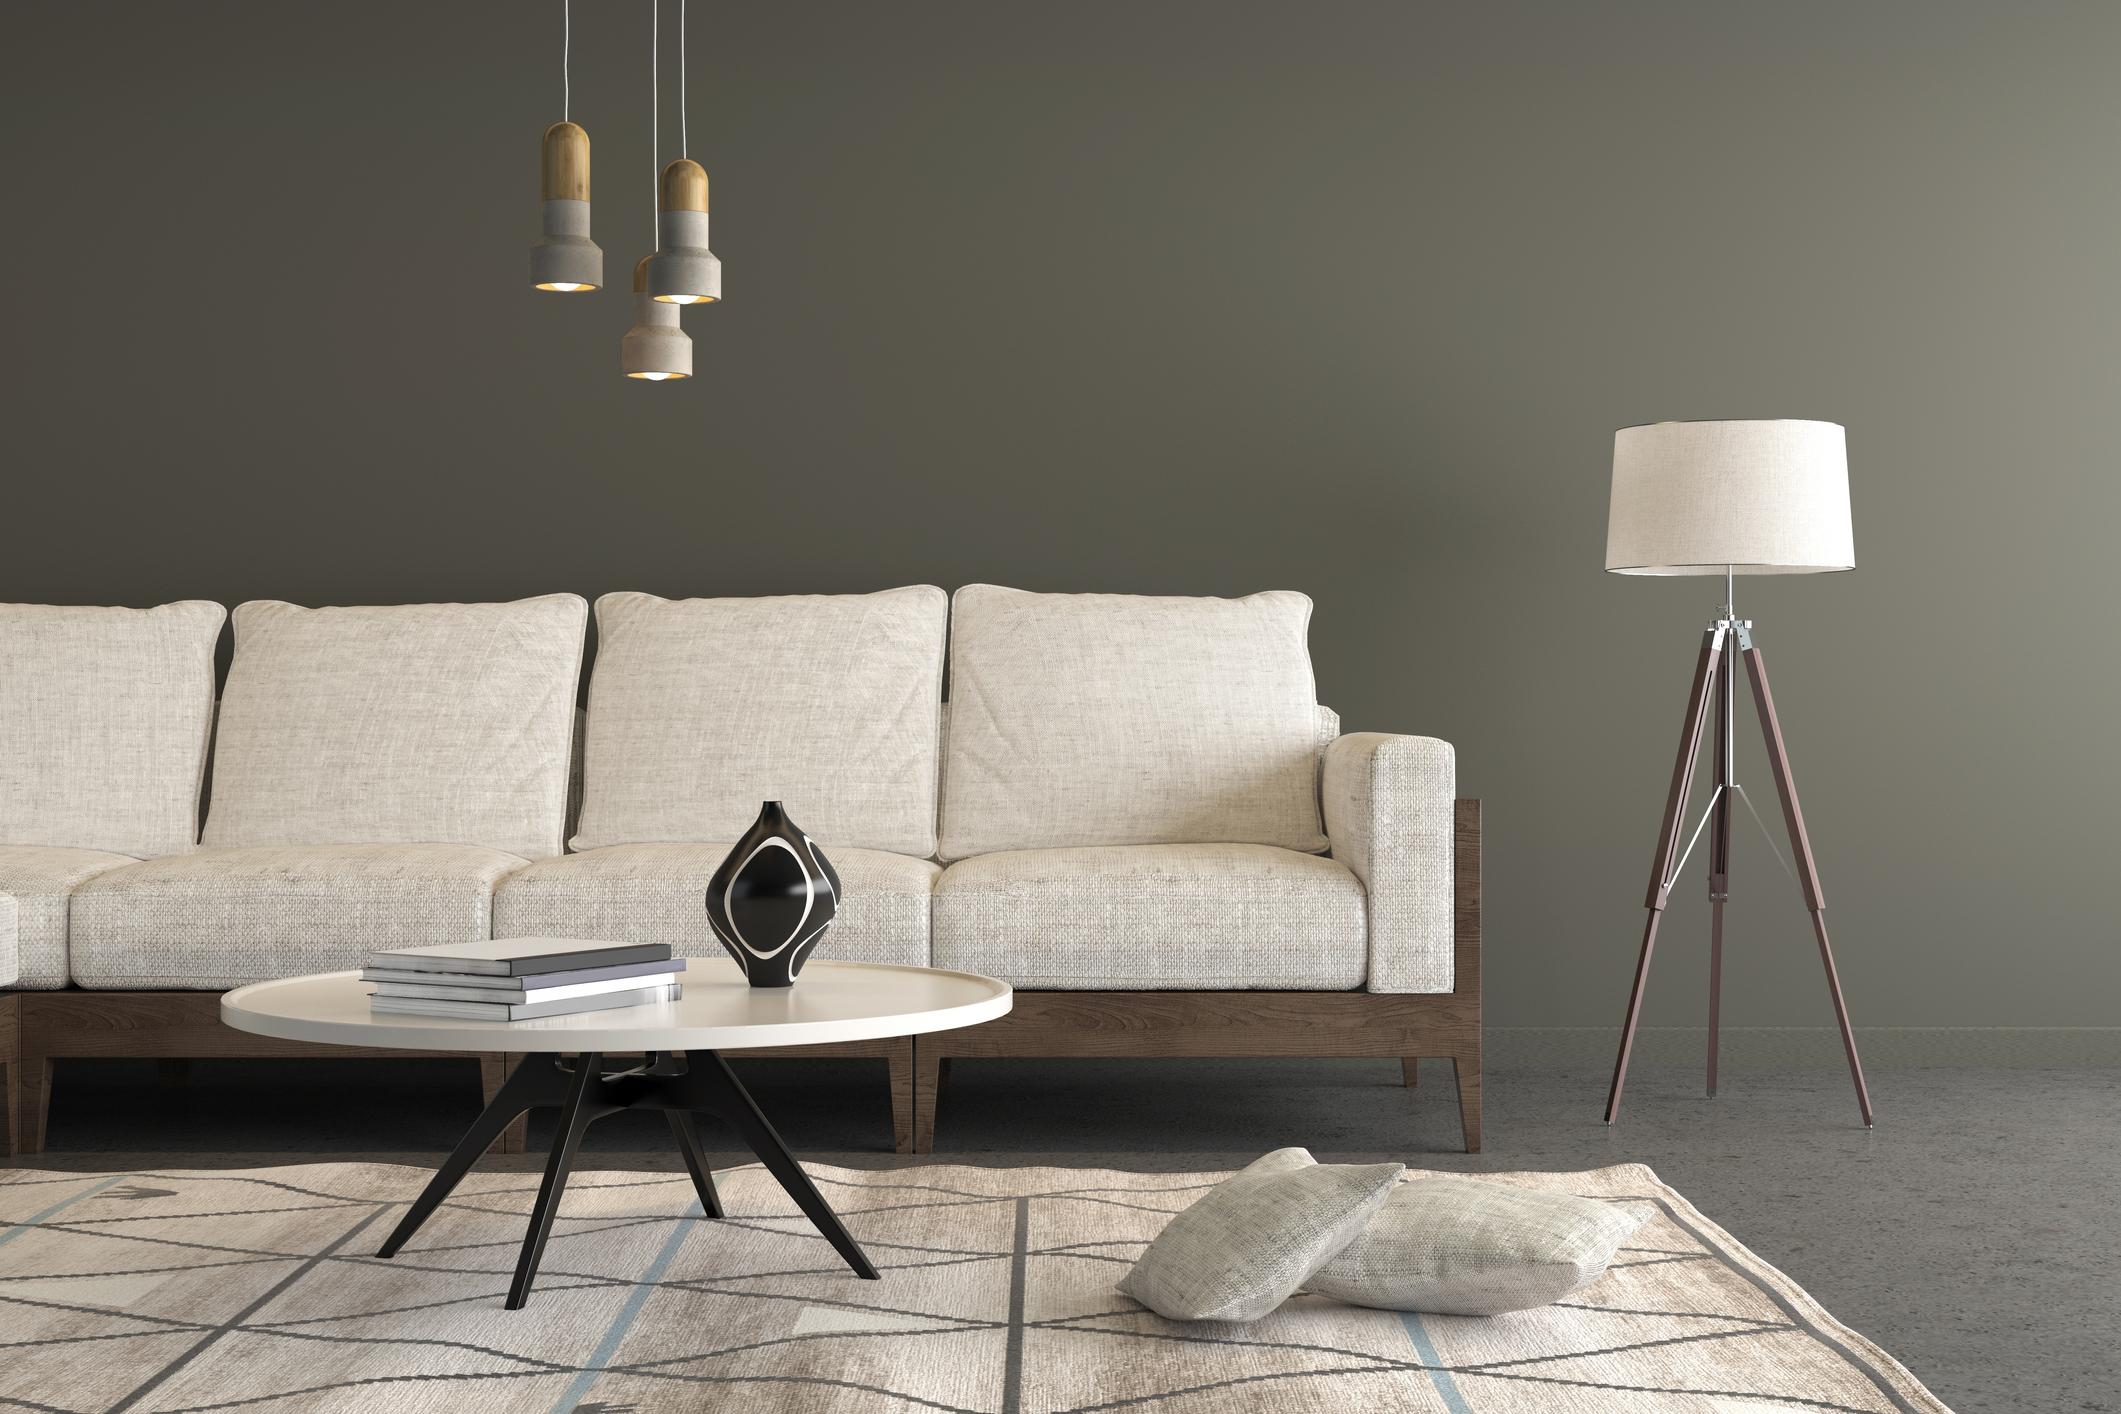 hygge-style-furniture-hotel.jpg